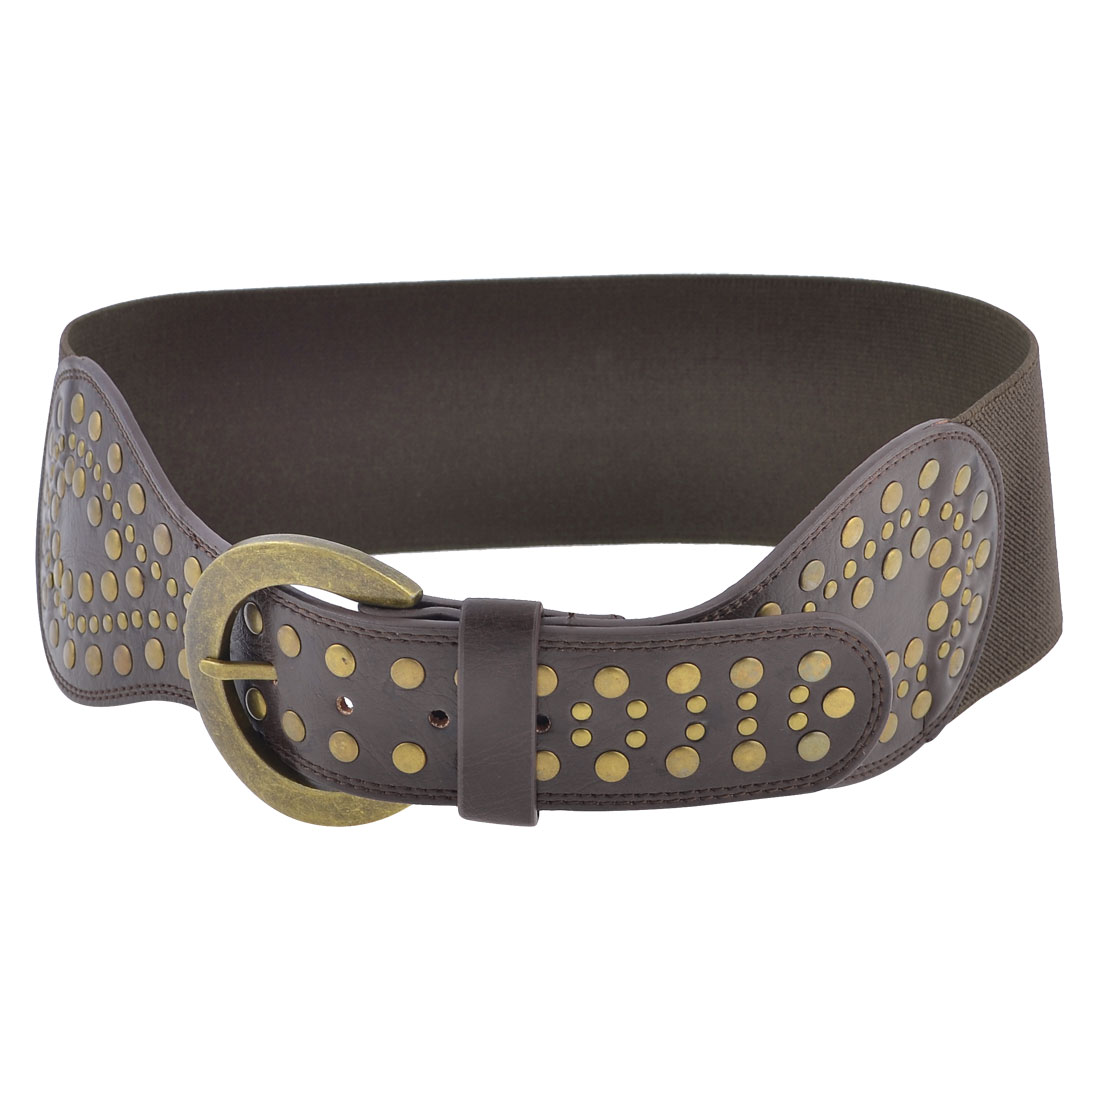 Rivet Detailing Single Pin Buckle Brown Elastic Cinch Waist Belt for Woman